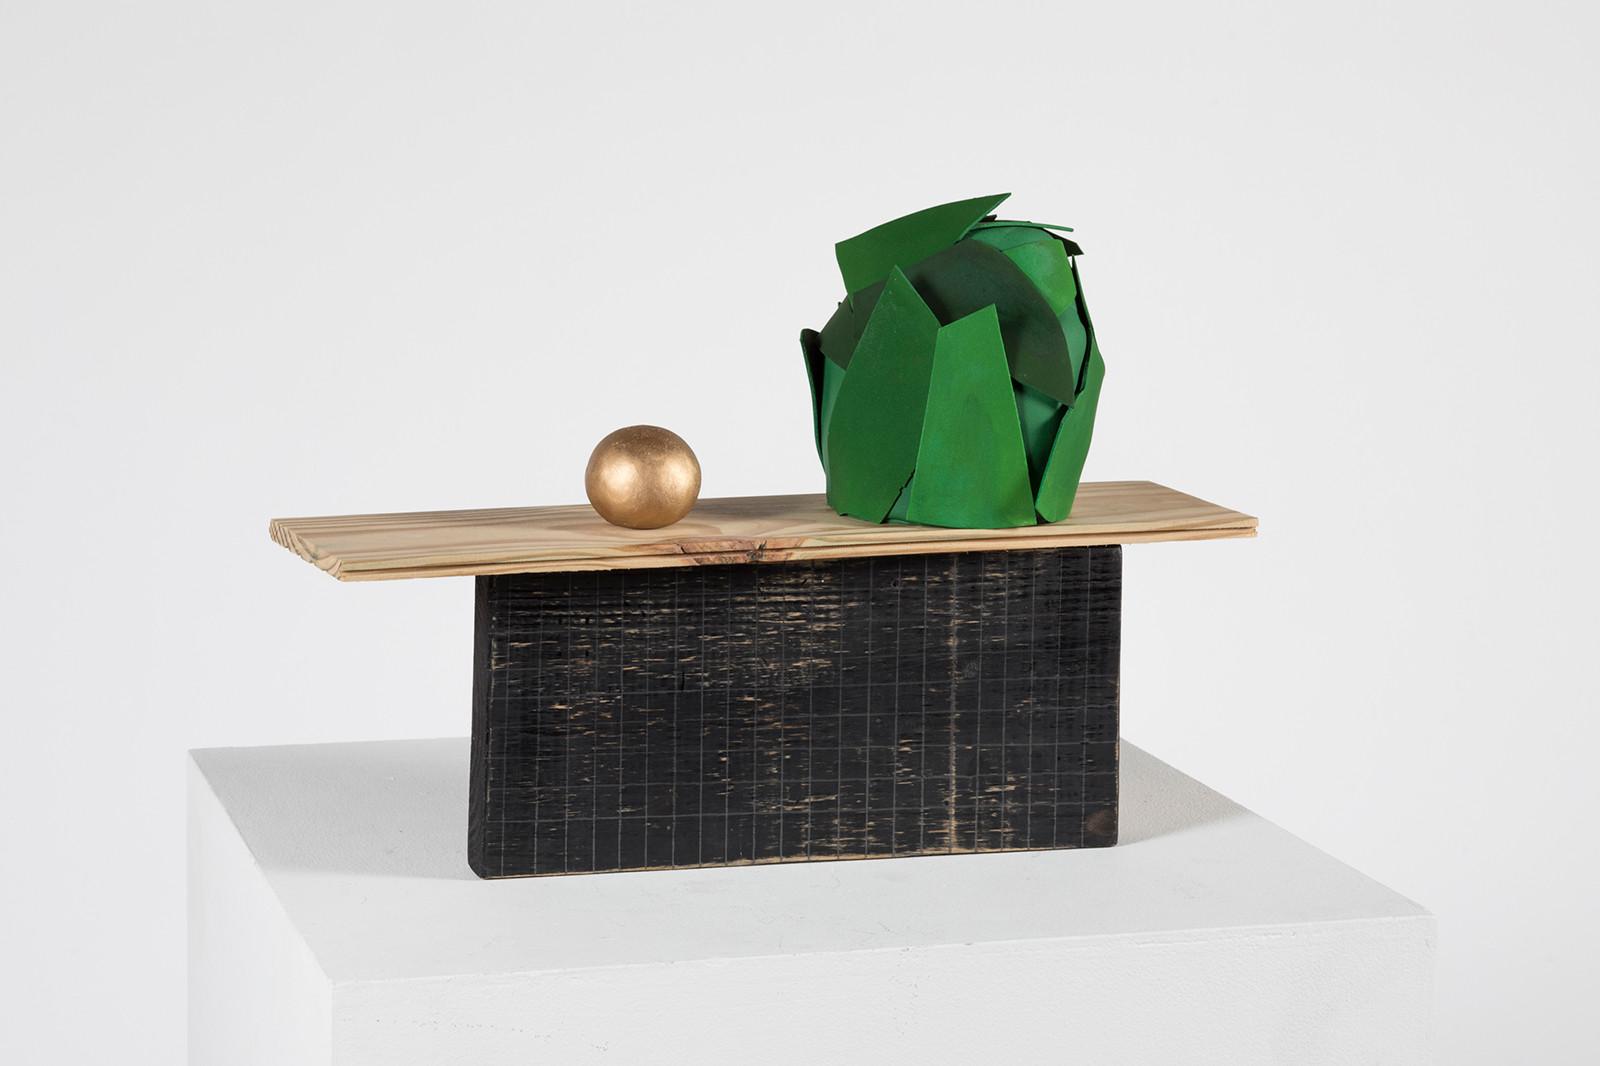 Gold ball, Green cake